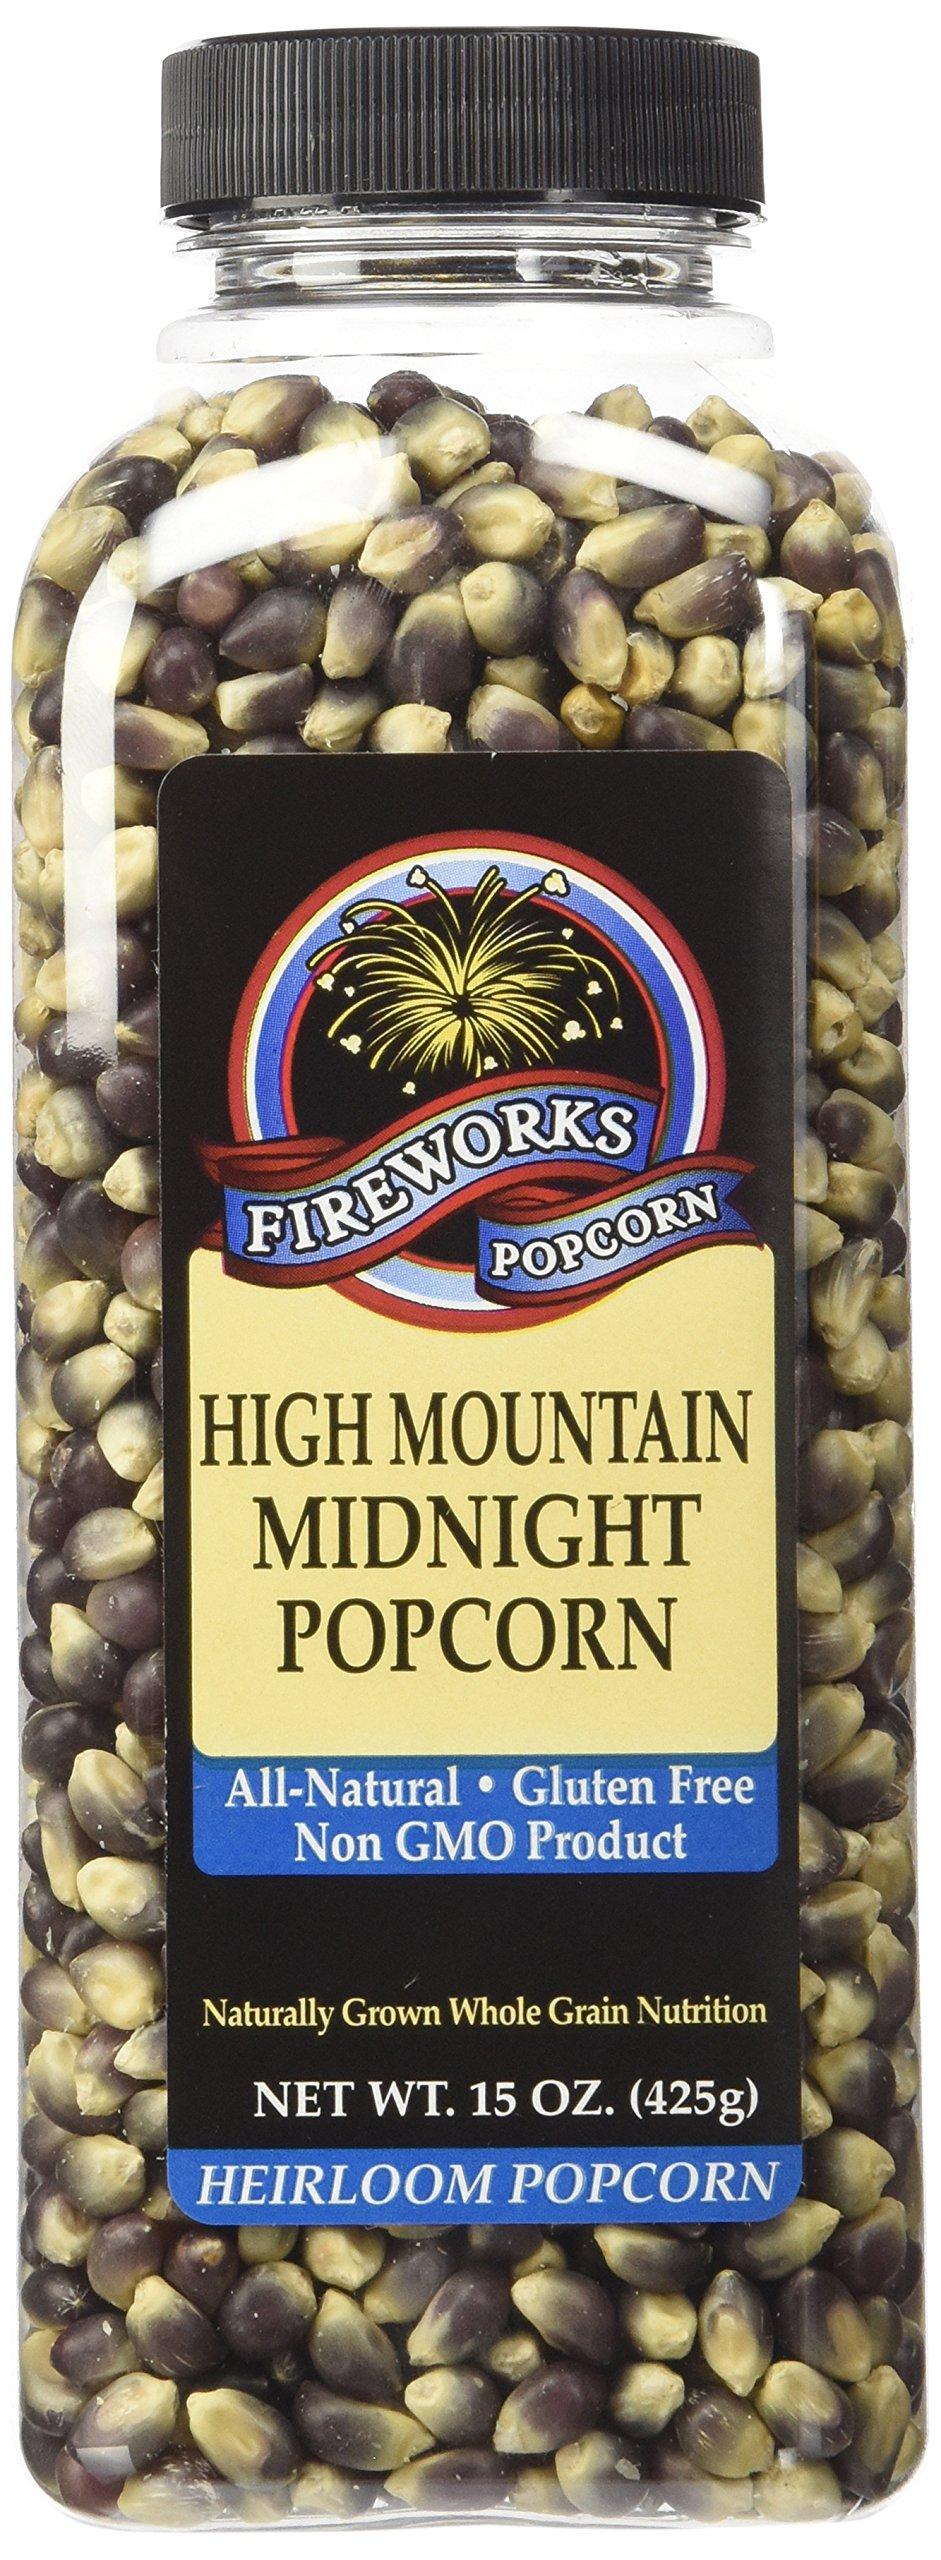 Fireworks Popcorn High Mountain Midnight Popcorn, 15-Ounce Bottles (Pack of 6)